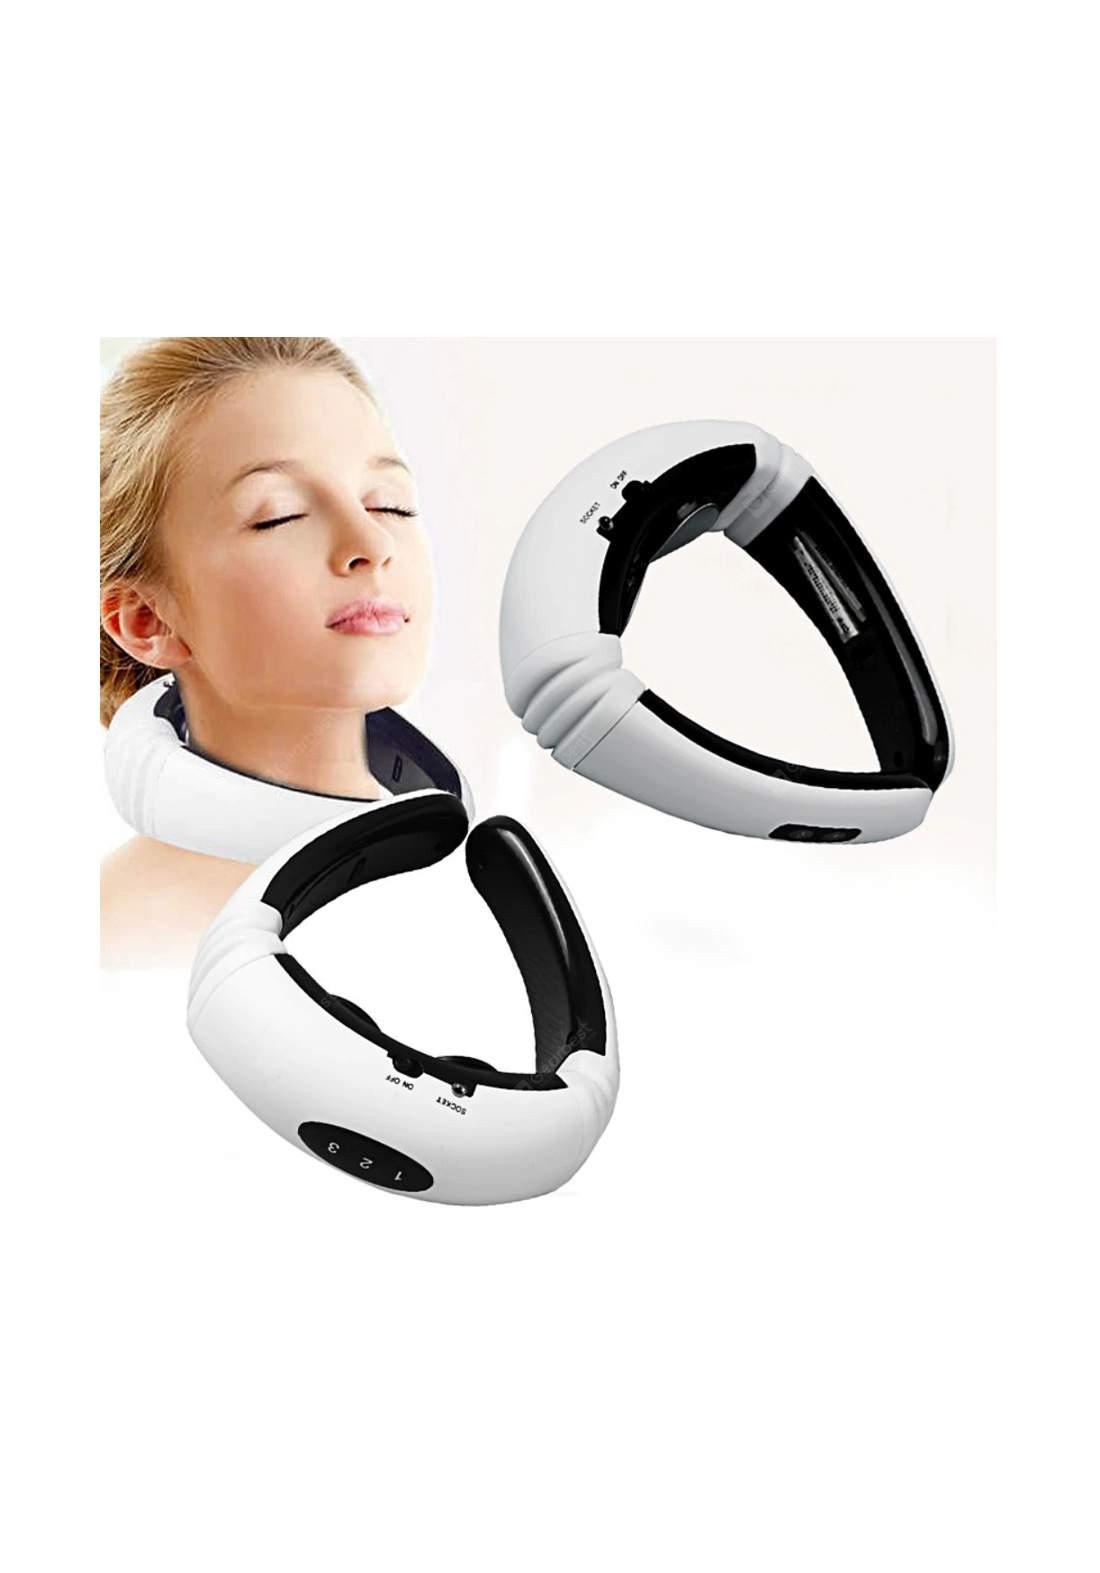 Electric Neck-Massager Magnetic Pulse KL-5830 جهاز مساج الرقبة